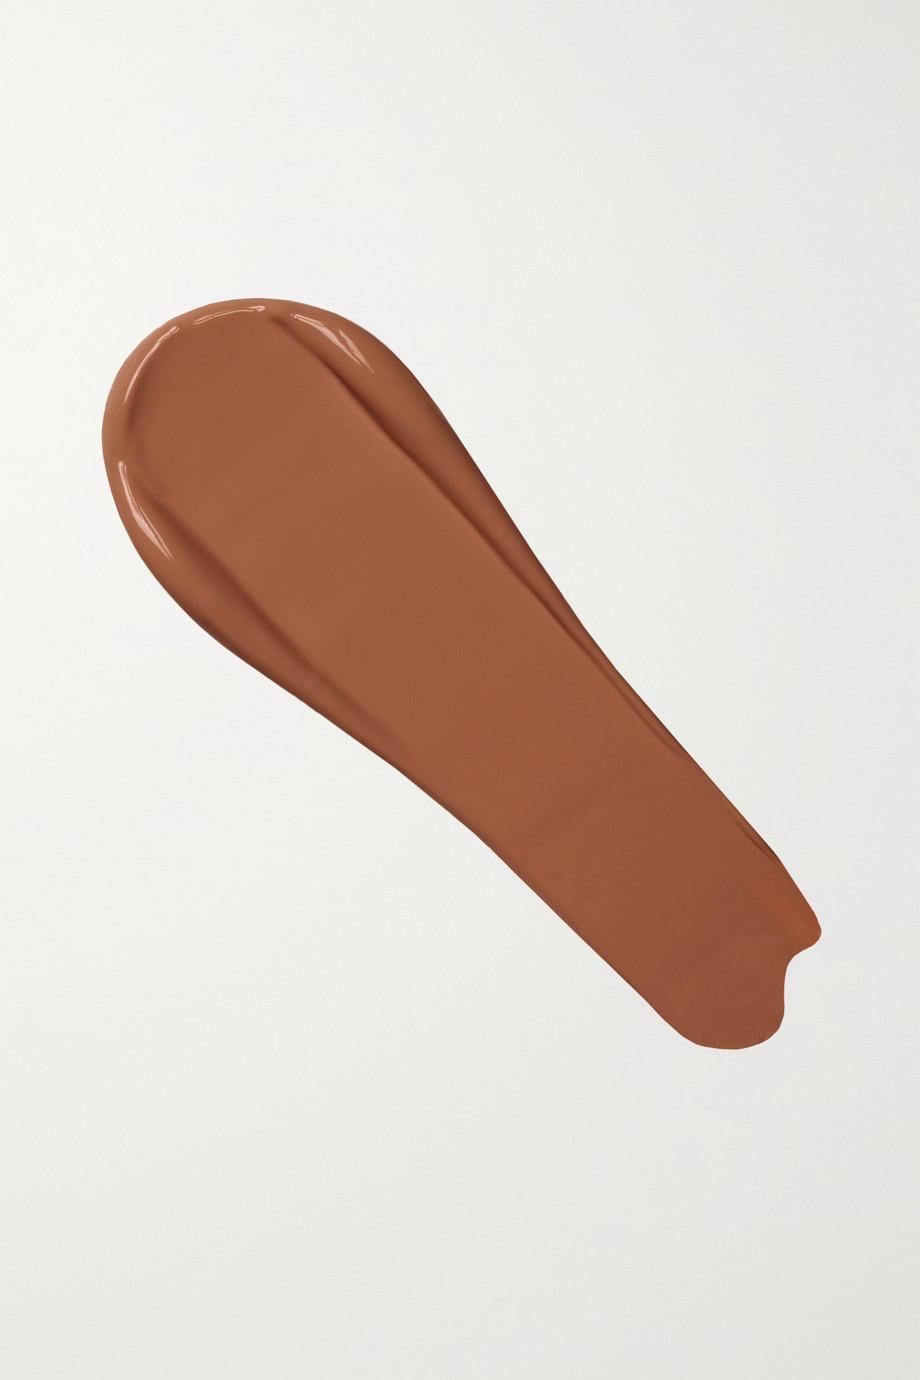 Pat McGrath Labs Skin Fetish: Sublime Perfection Concealer - MD27, 5ml